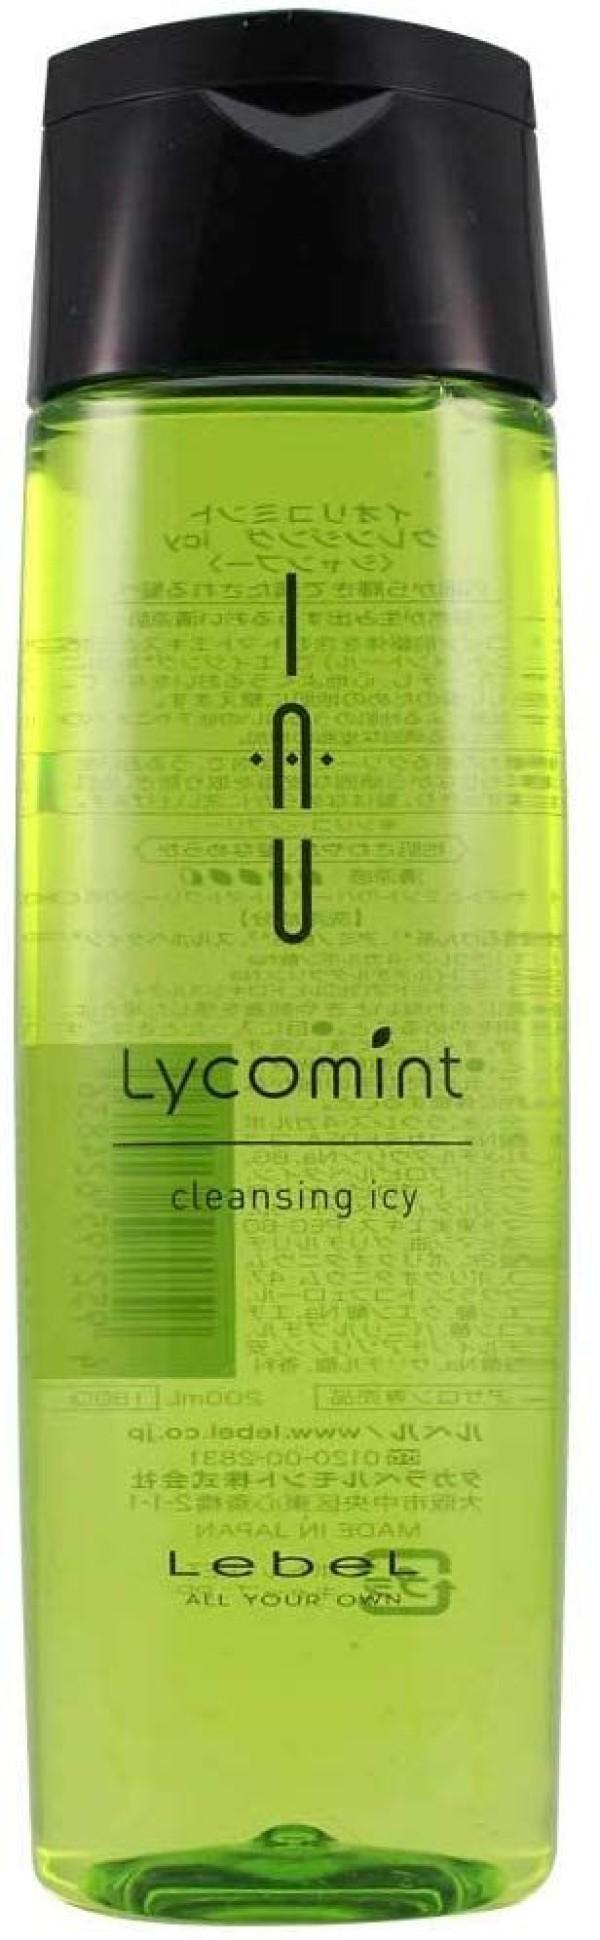 Lebel IAU Lycomint Cleansing Icy Shampoo